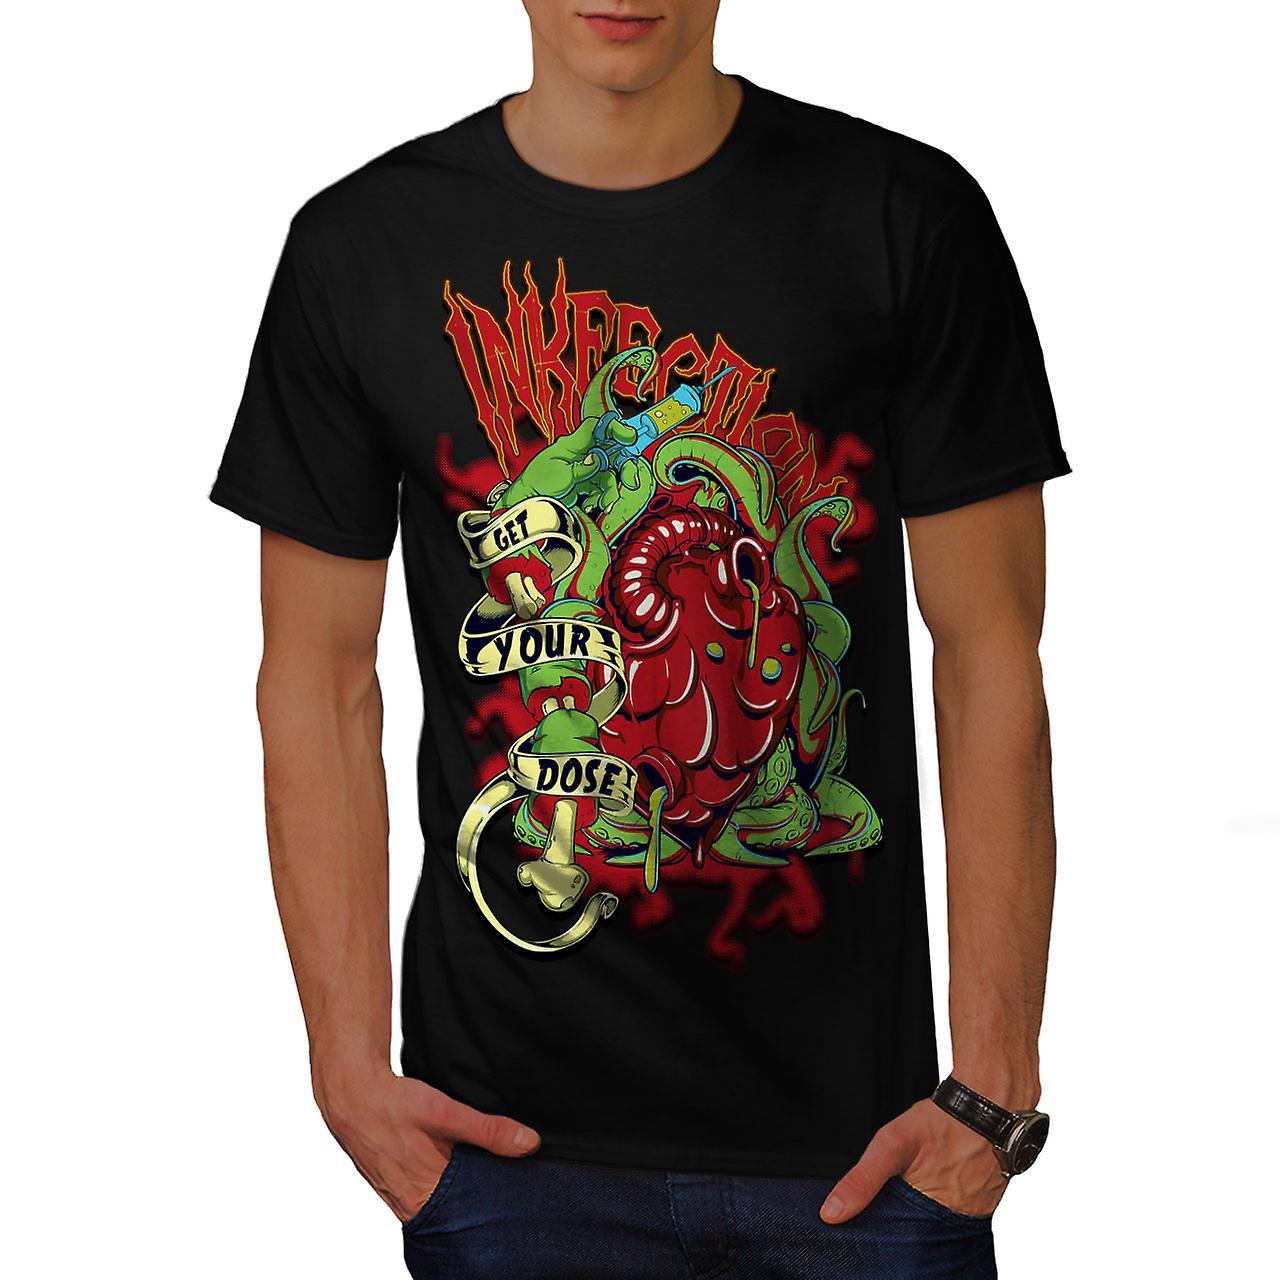 Get Your Dose Dead Horror Men Black T-shirt | Wellcoda